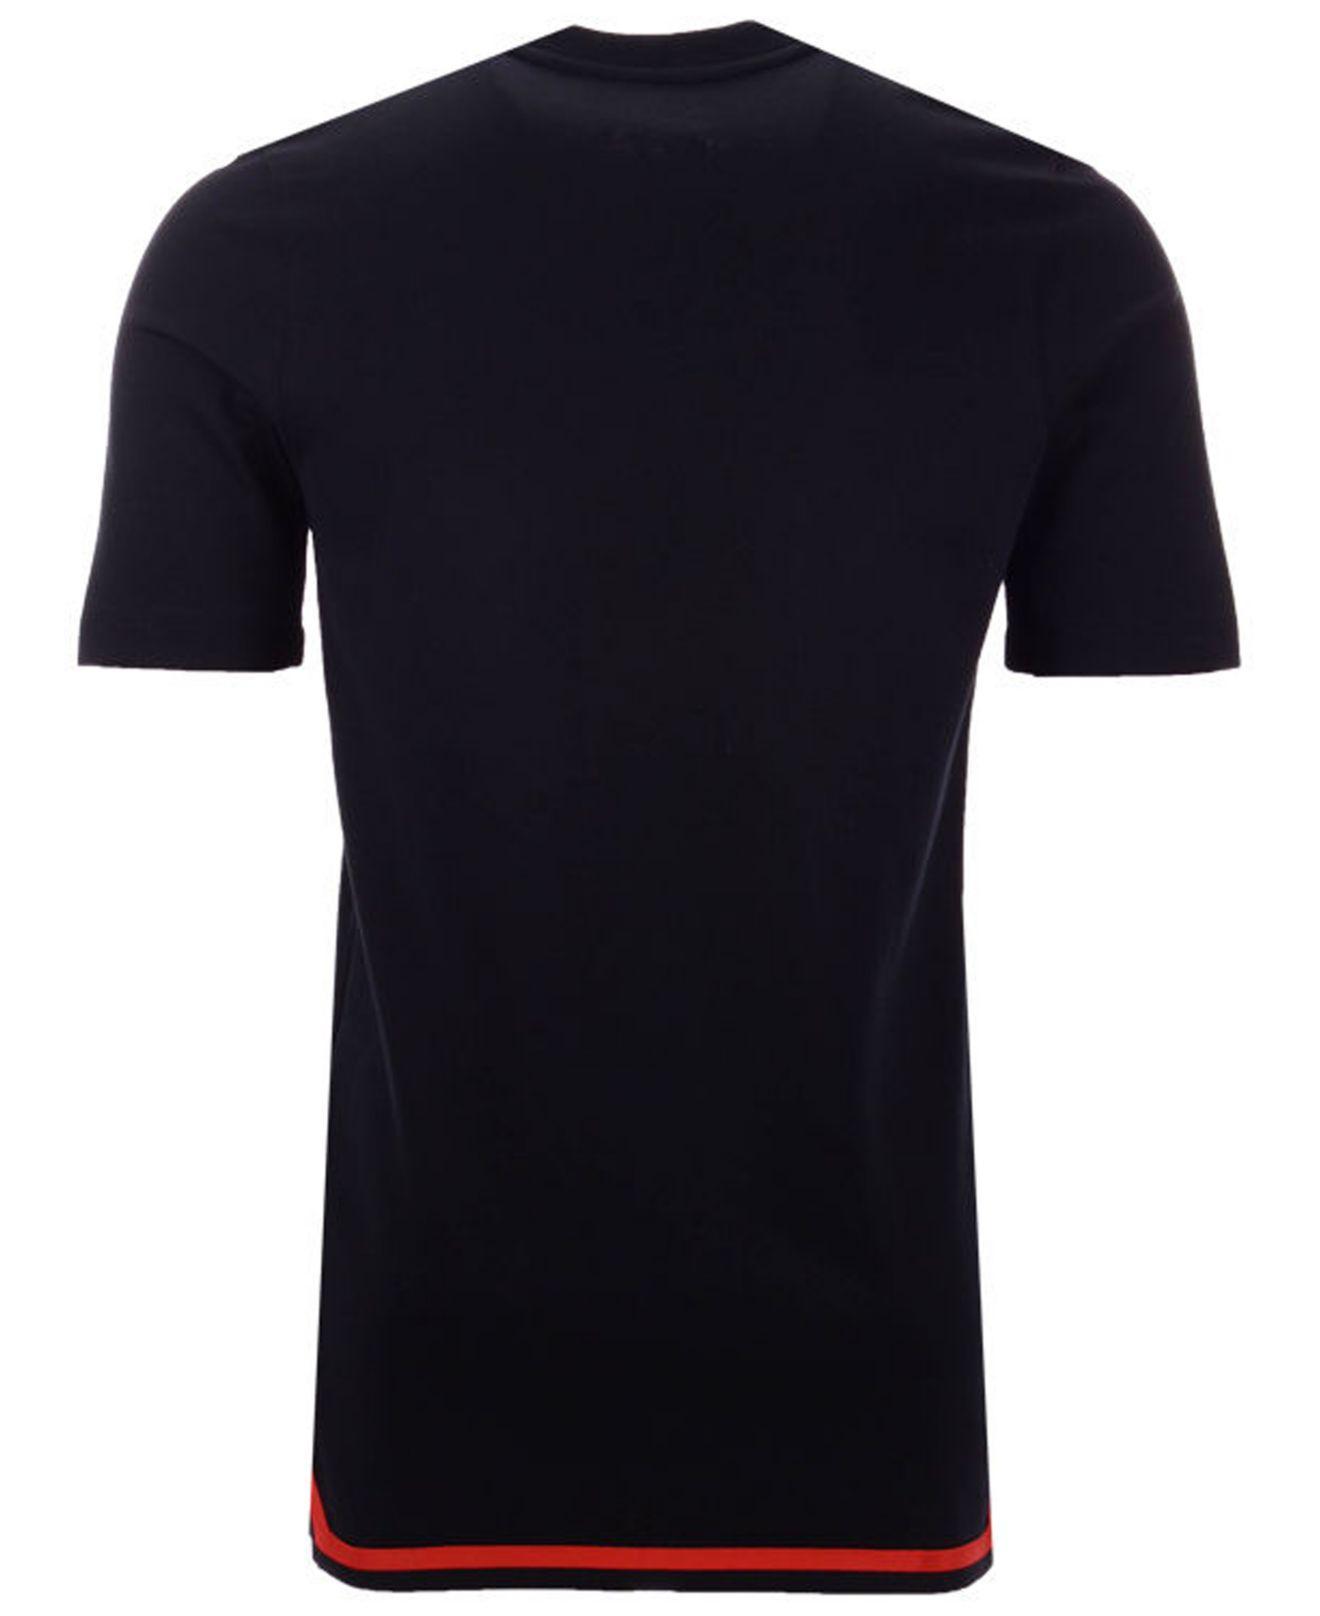 Lyst - Nike Portland Trail Blazers City Edition Shooting T-shirt in Black  for Men f5511c449